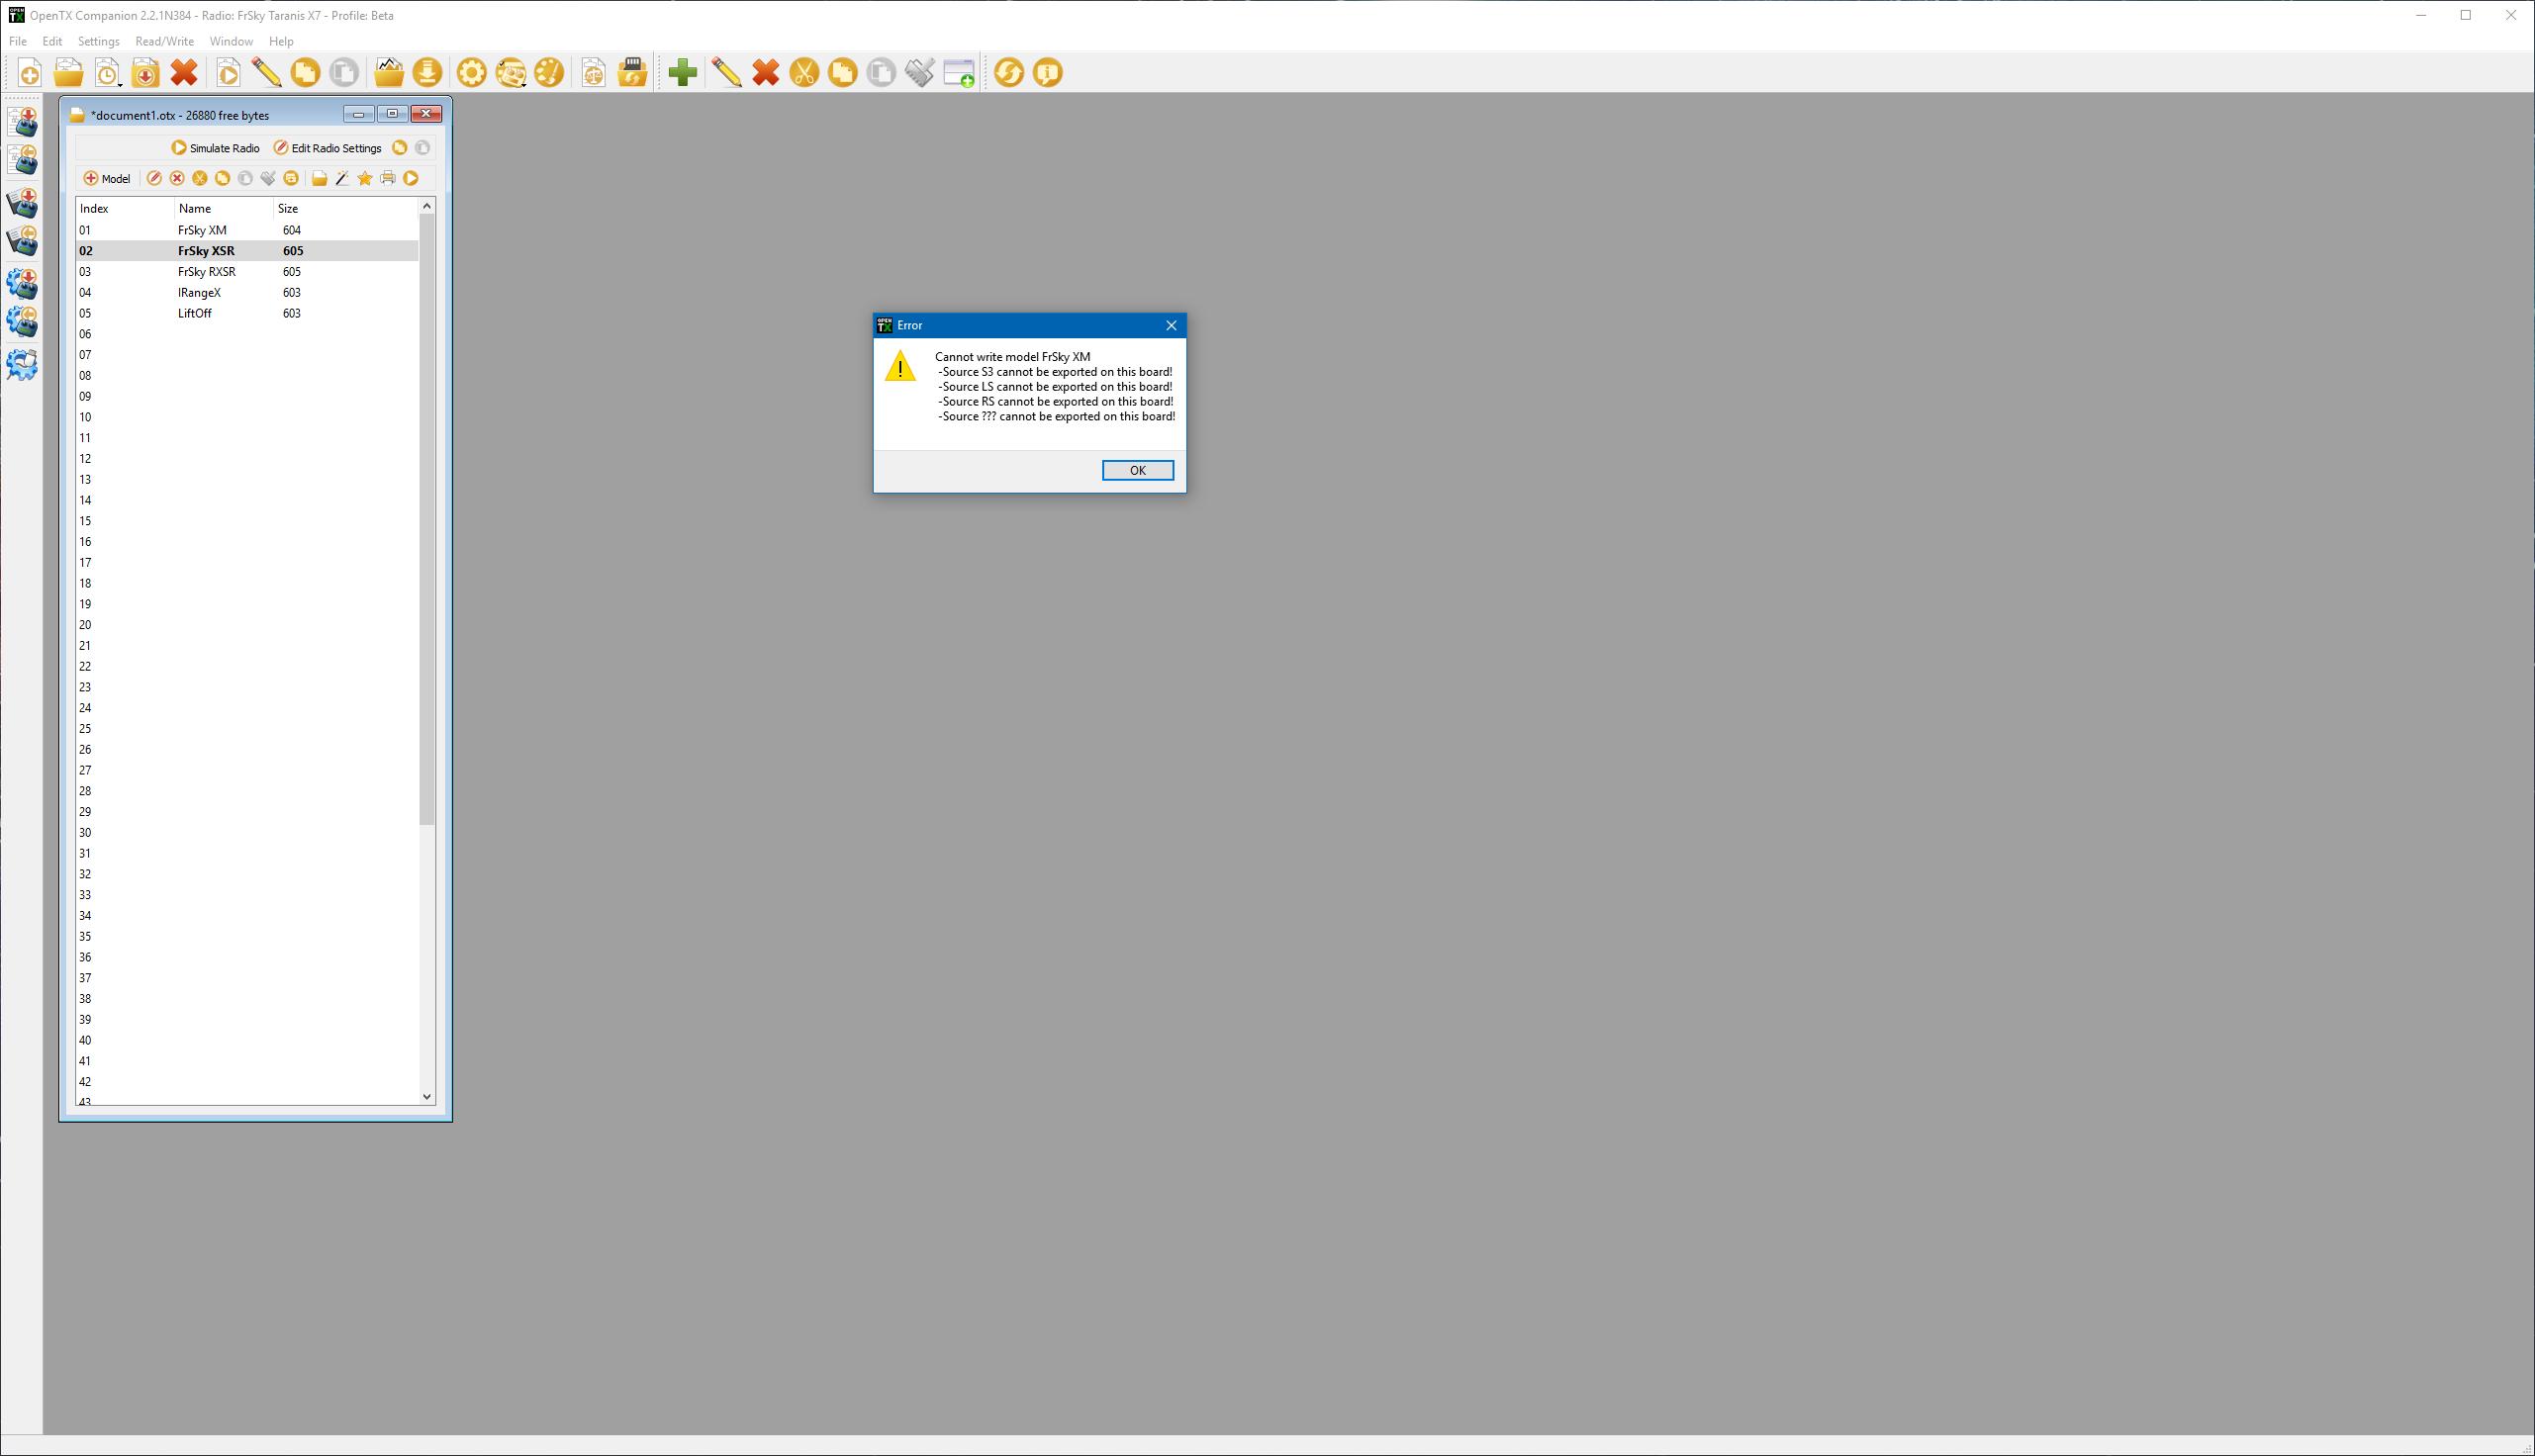 Errors on write model to radio · Issue #5229 · opentx/opentx